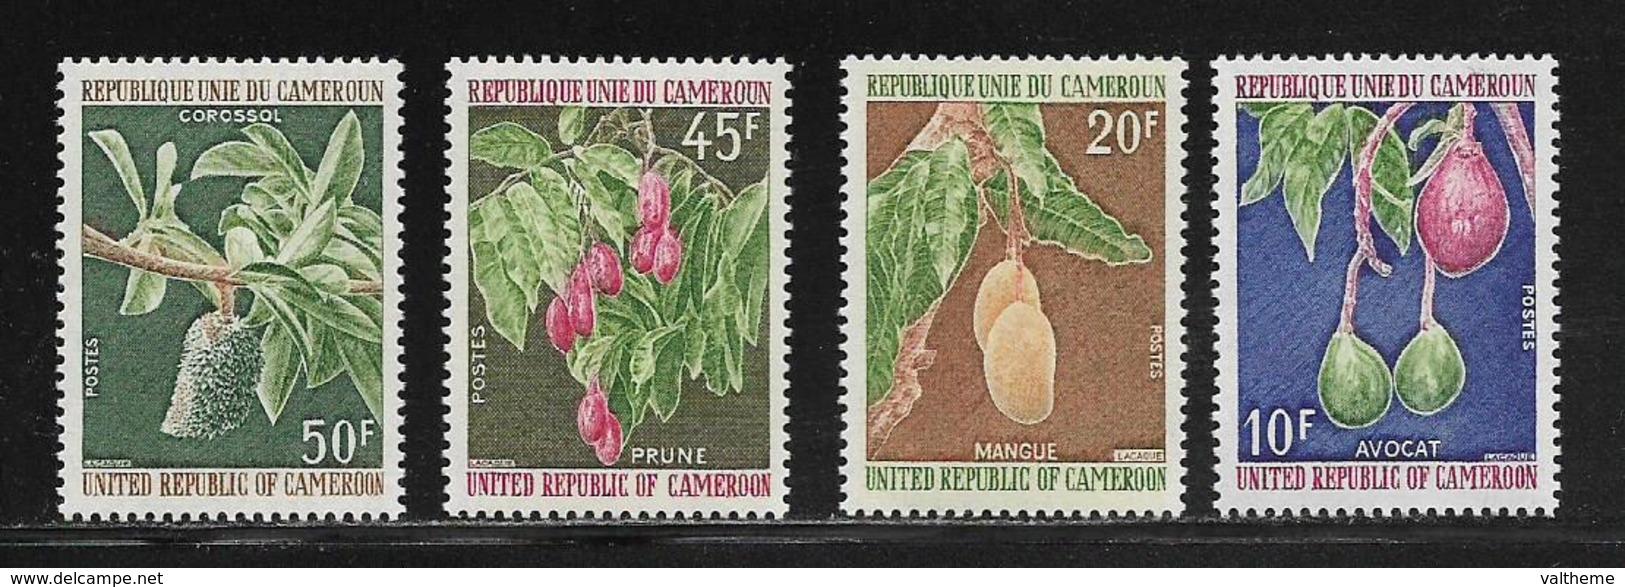 CAMEROUN  ( AFCA - 77 )  1973  N° YVERT ET TELLIER   N° 554/557   N** - Camerun (1960-...)